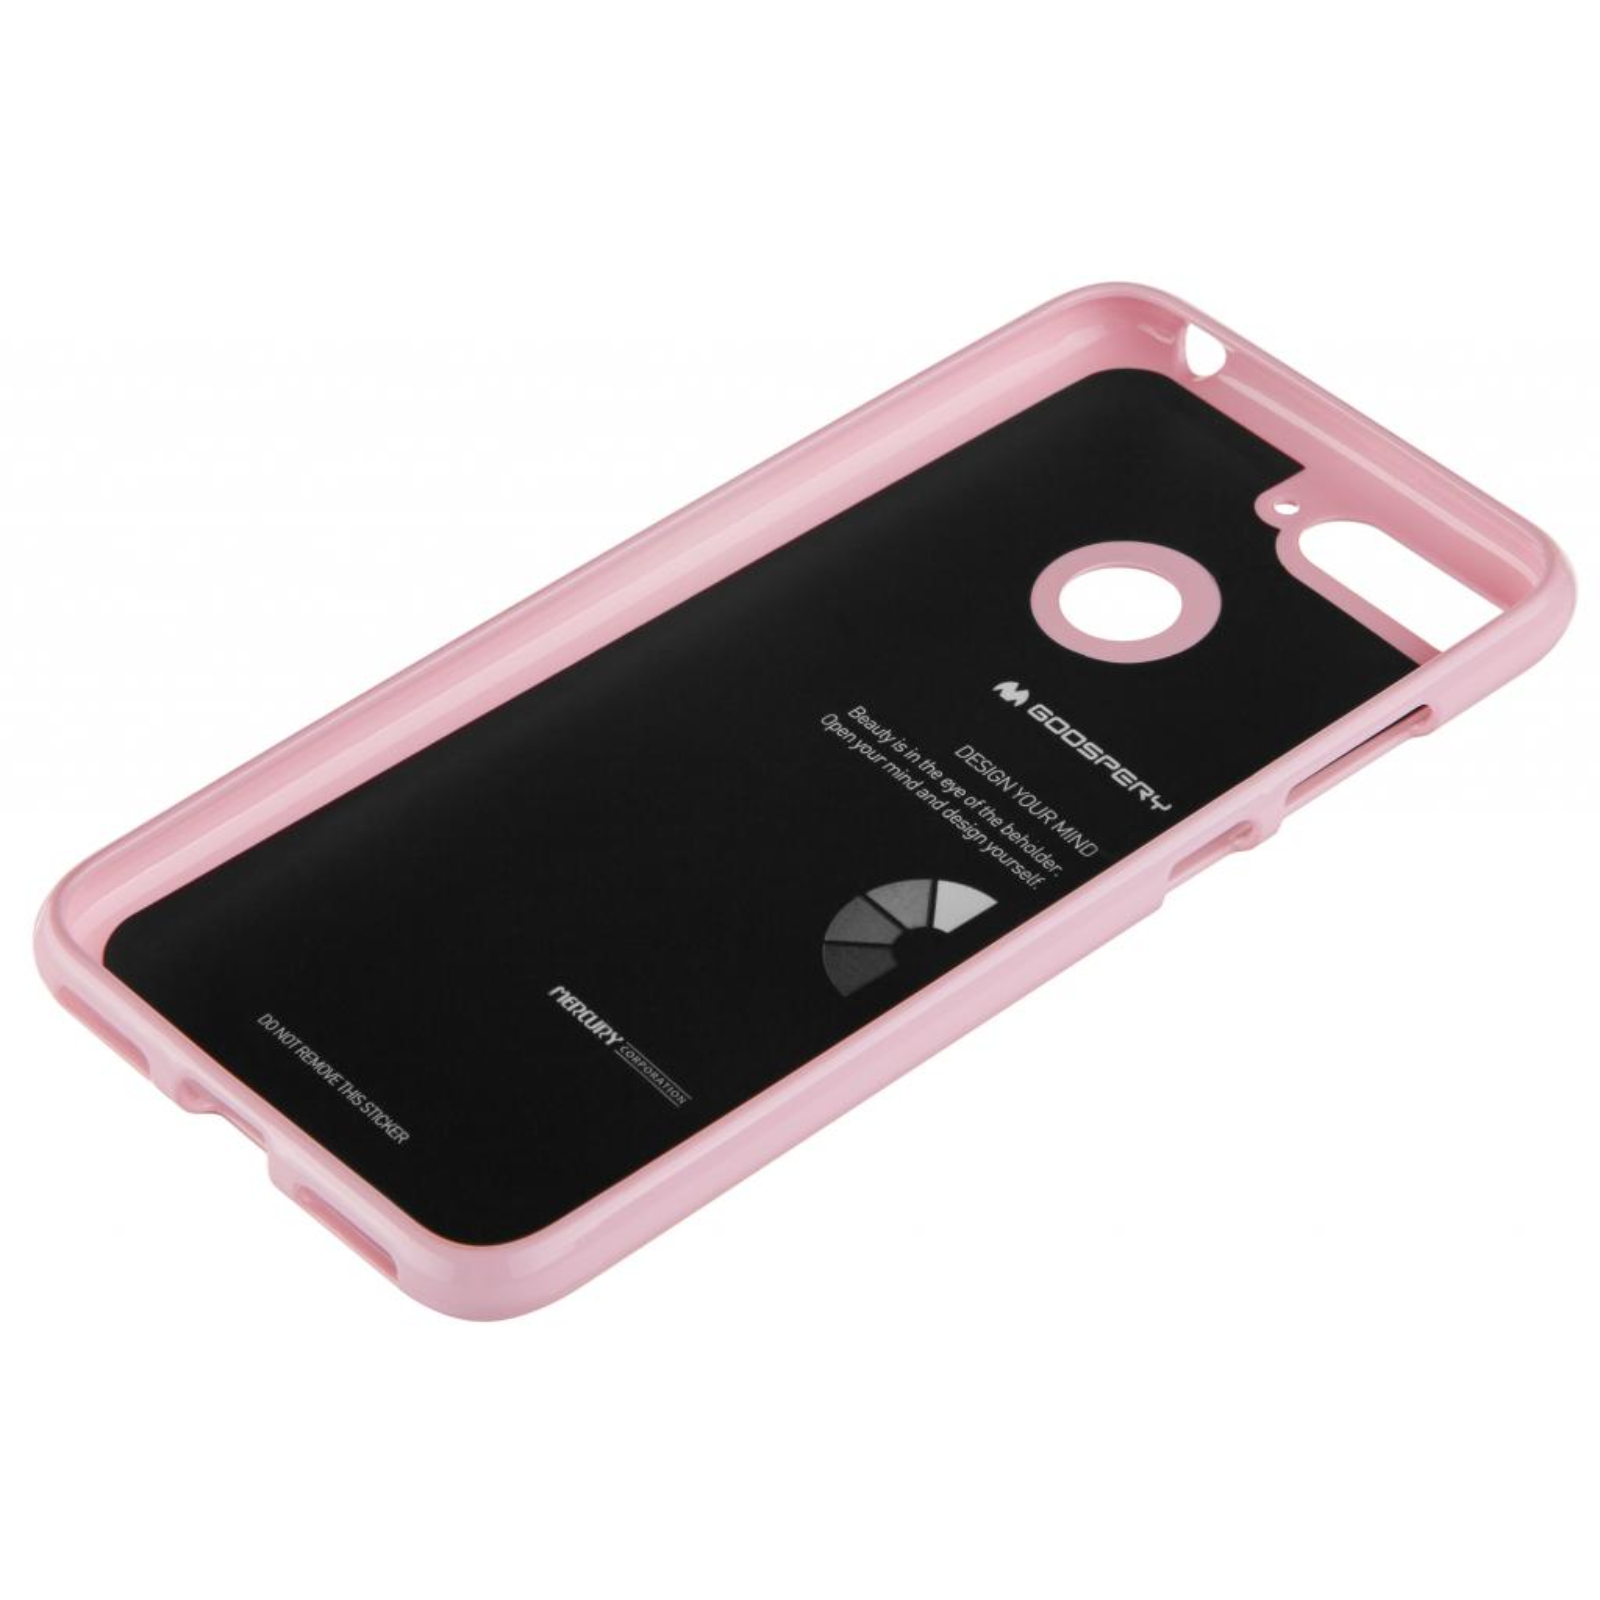 Чохол до моб. телефона Goospery Jelly Case для Huawei Y6 Prime 2018 Pink (8809610540577) зображення 2